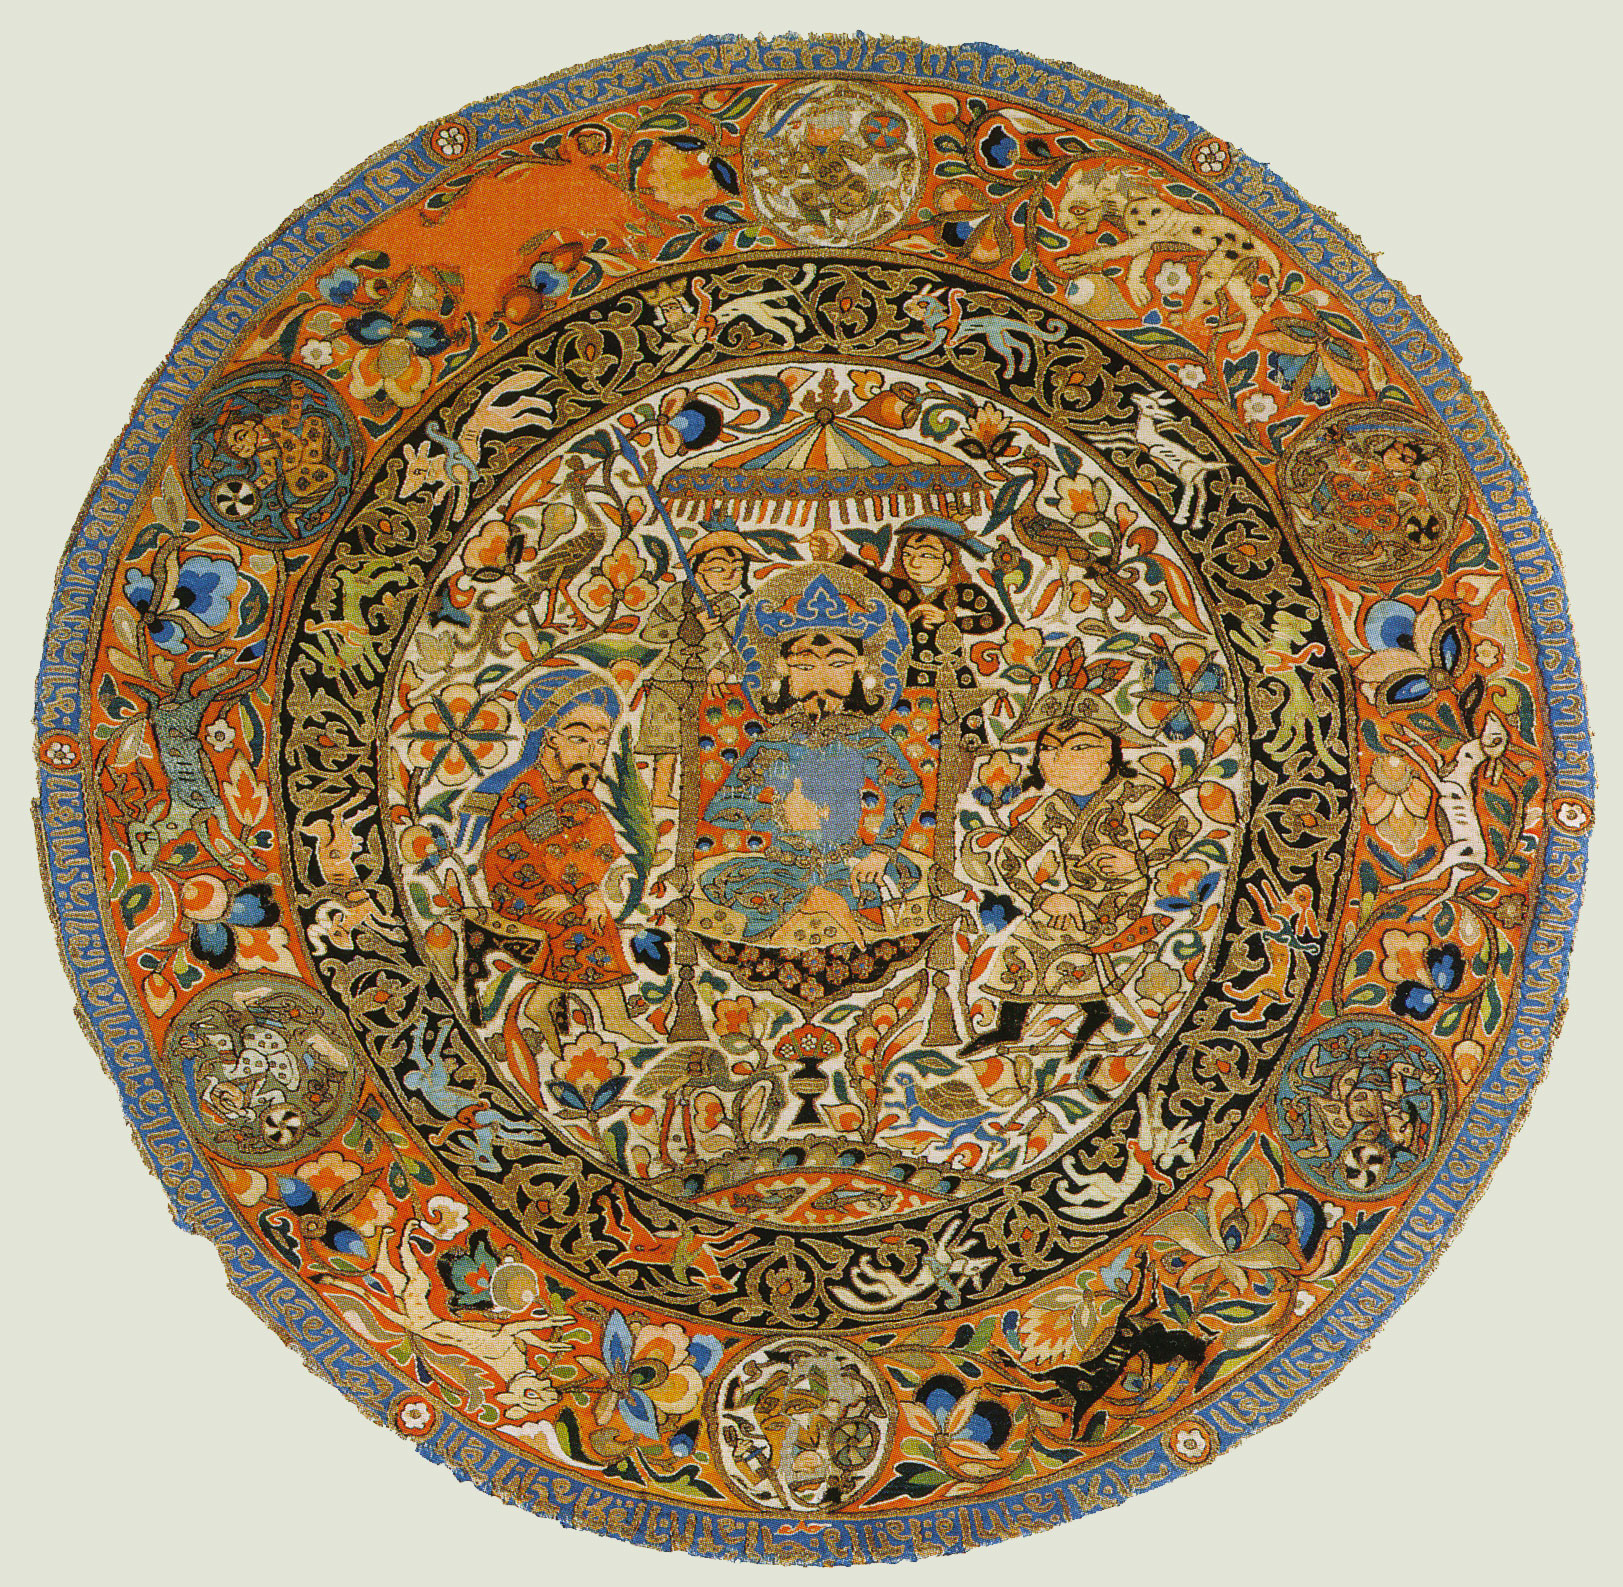 Islamic art and calligraphy - Intoduction - Historum ...